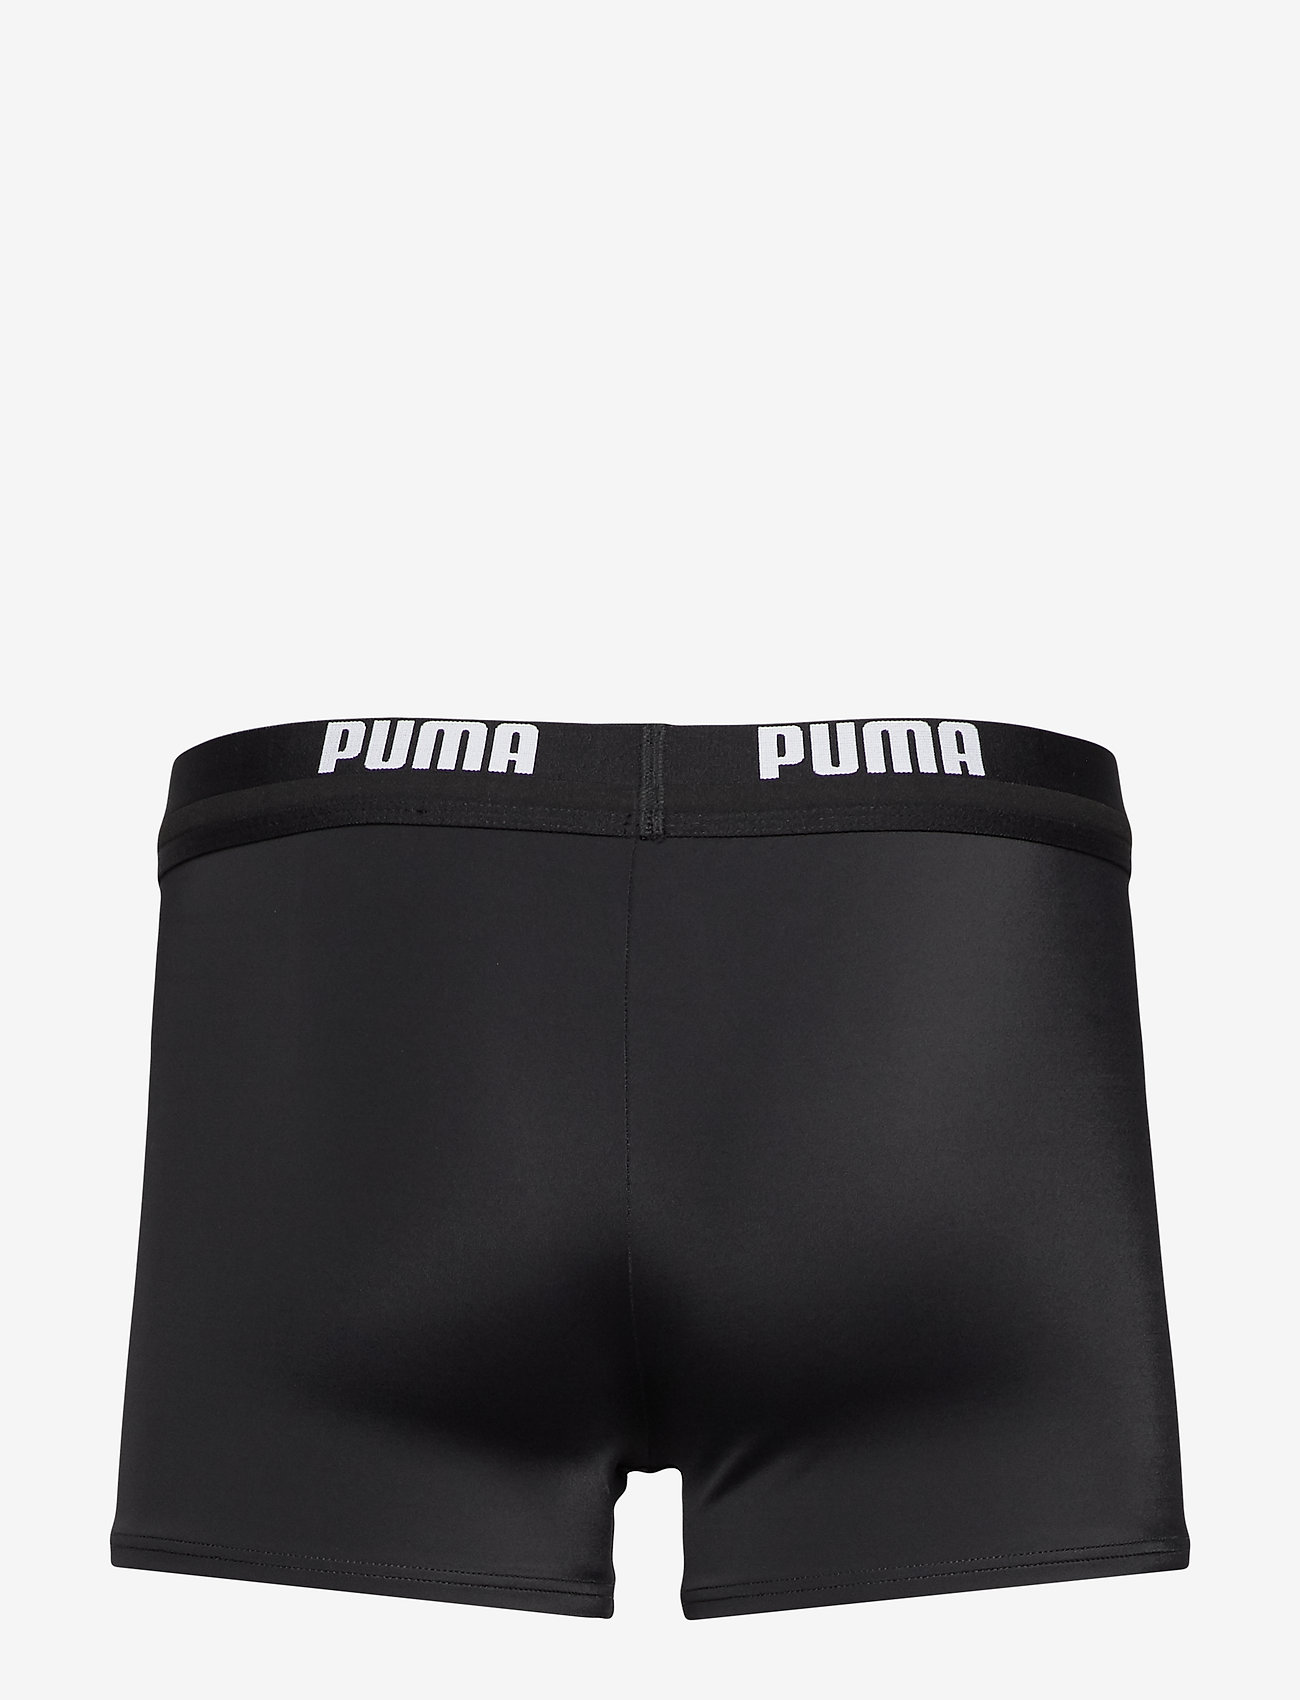 Puma Swim - PUMA SWIM MEN LOGO SWIM TRUNK 1P - shorts - black - 1